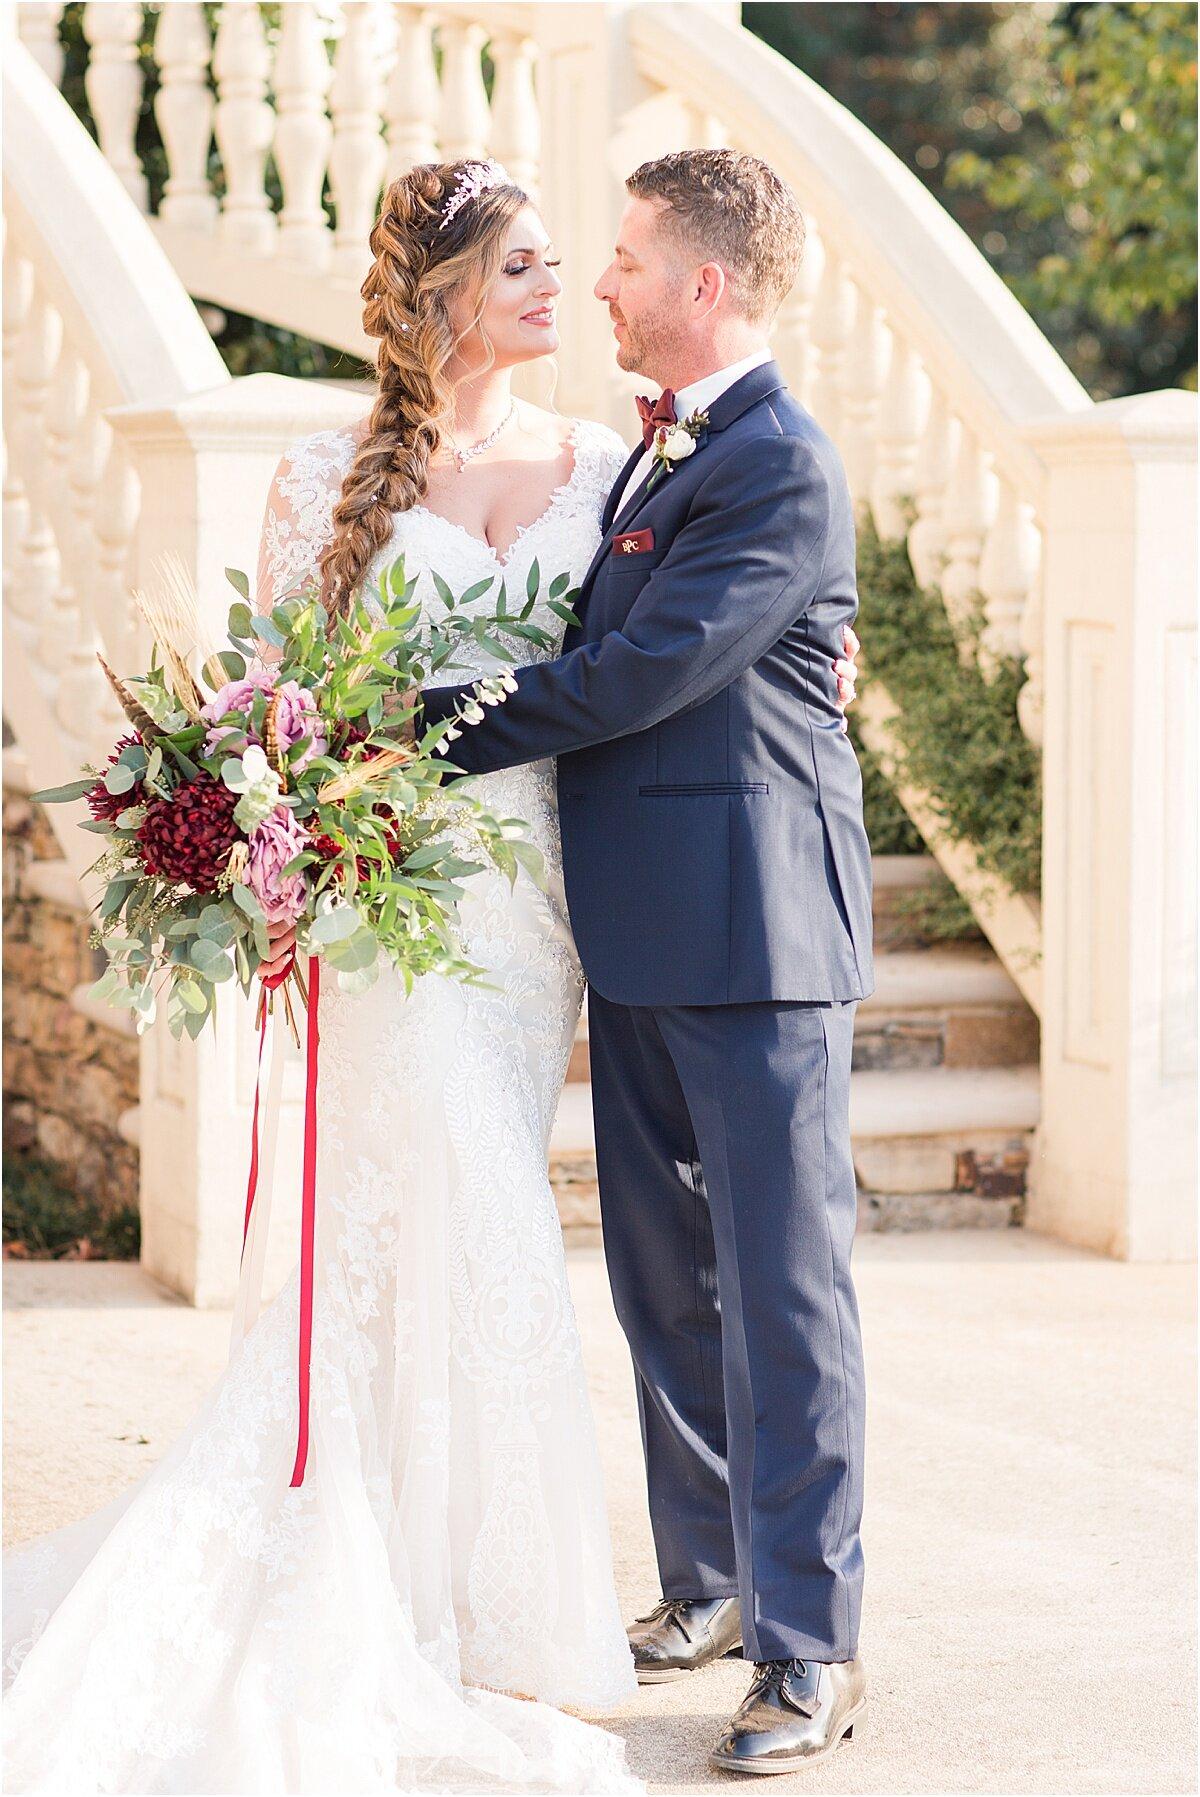 Jersey_Ga_Wedding_Venues_Holly_L_Robbins_Photography_0089.jpg